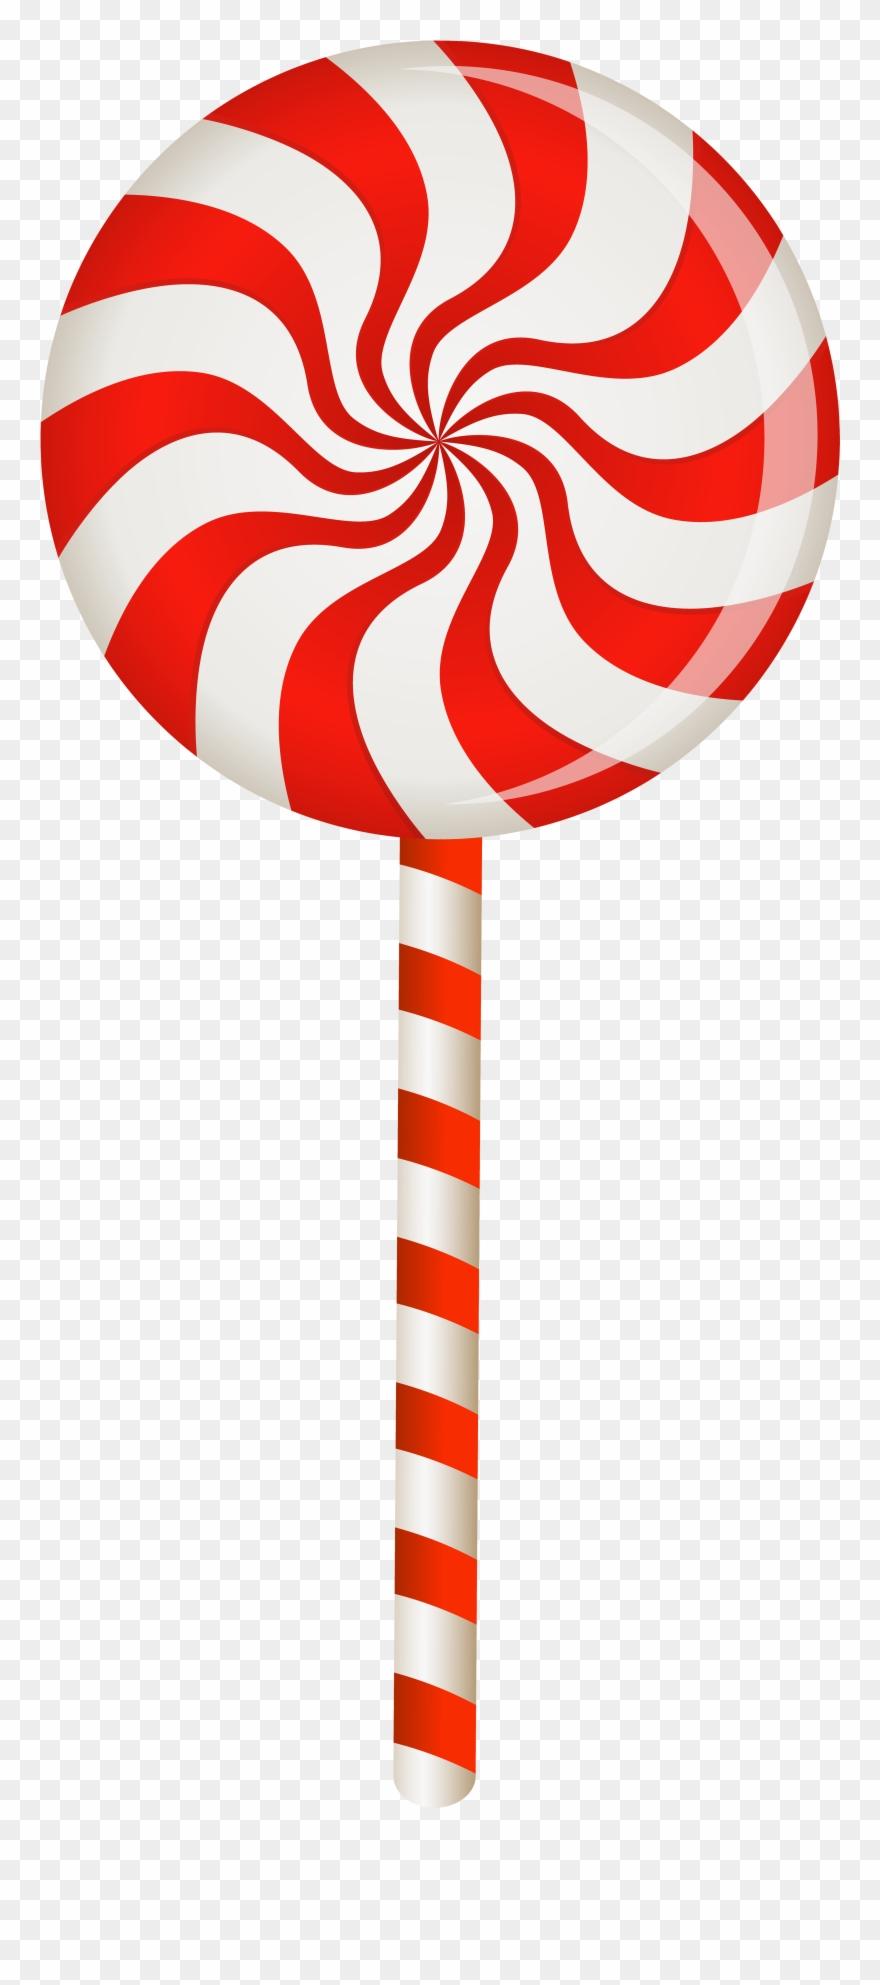 medium resolution of transparent background lollipop clipart png download